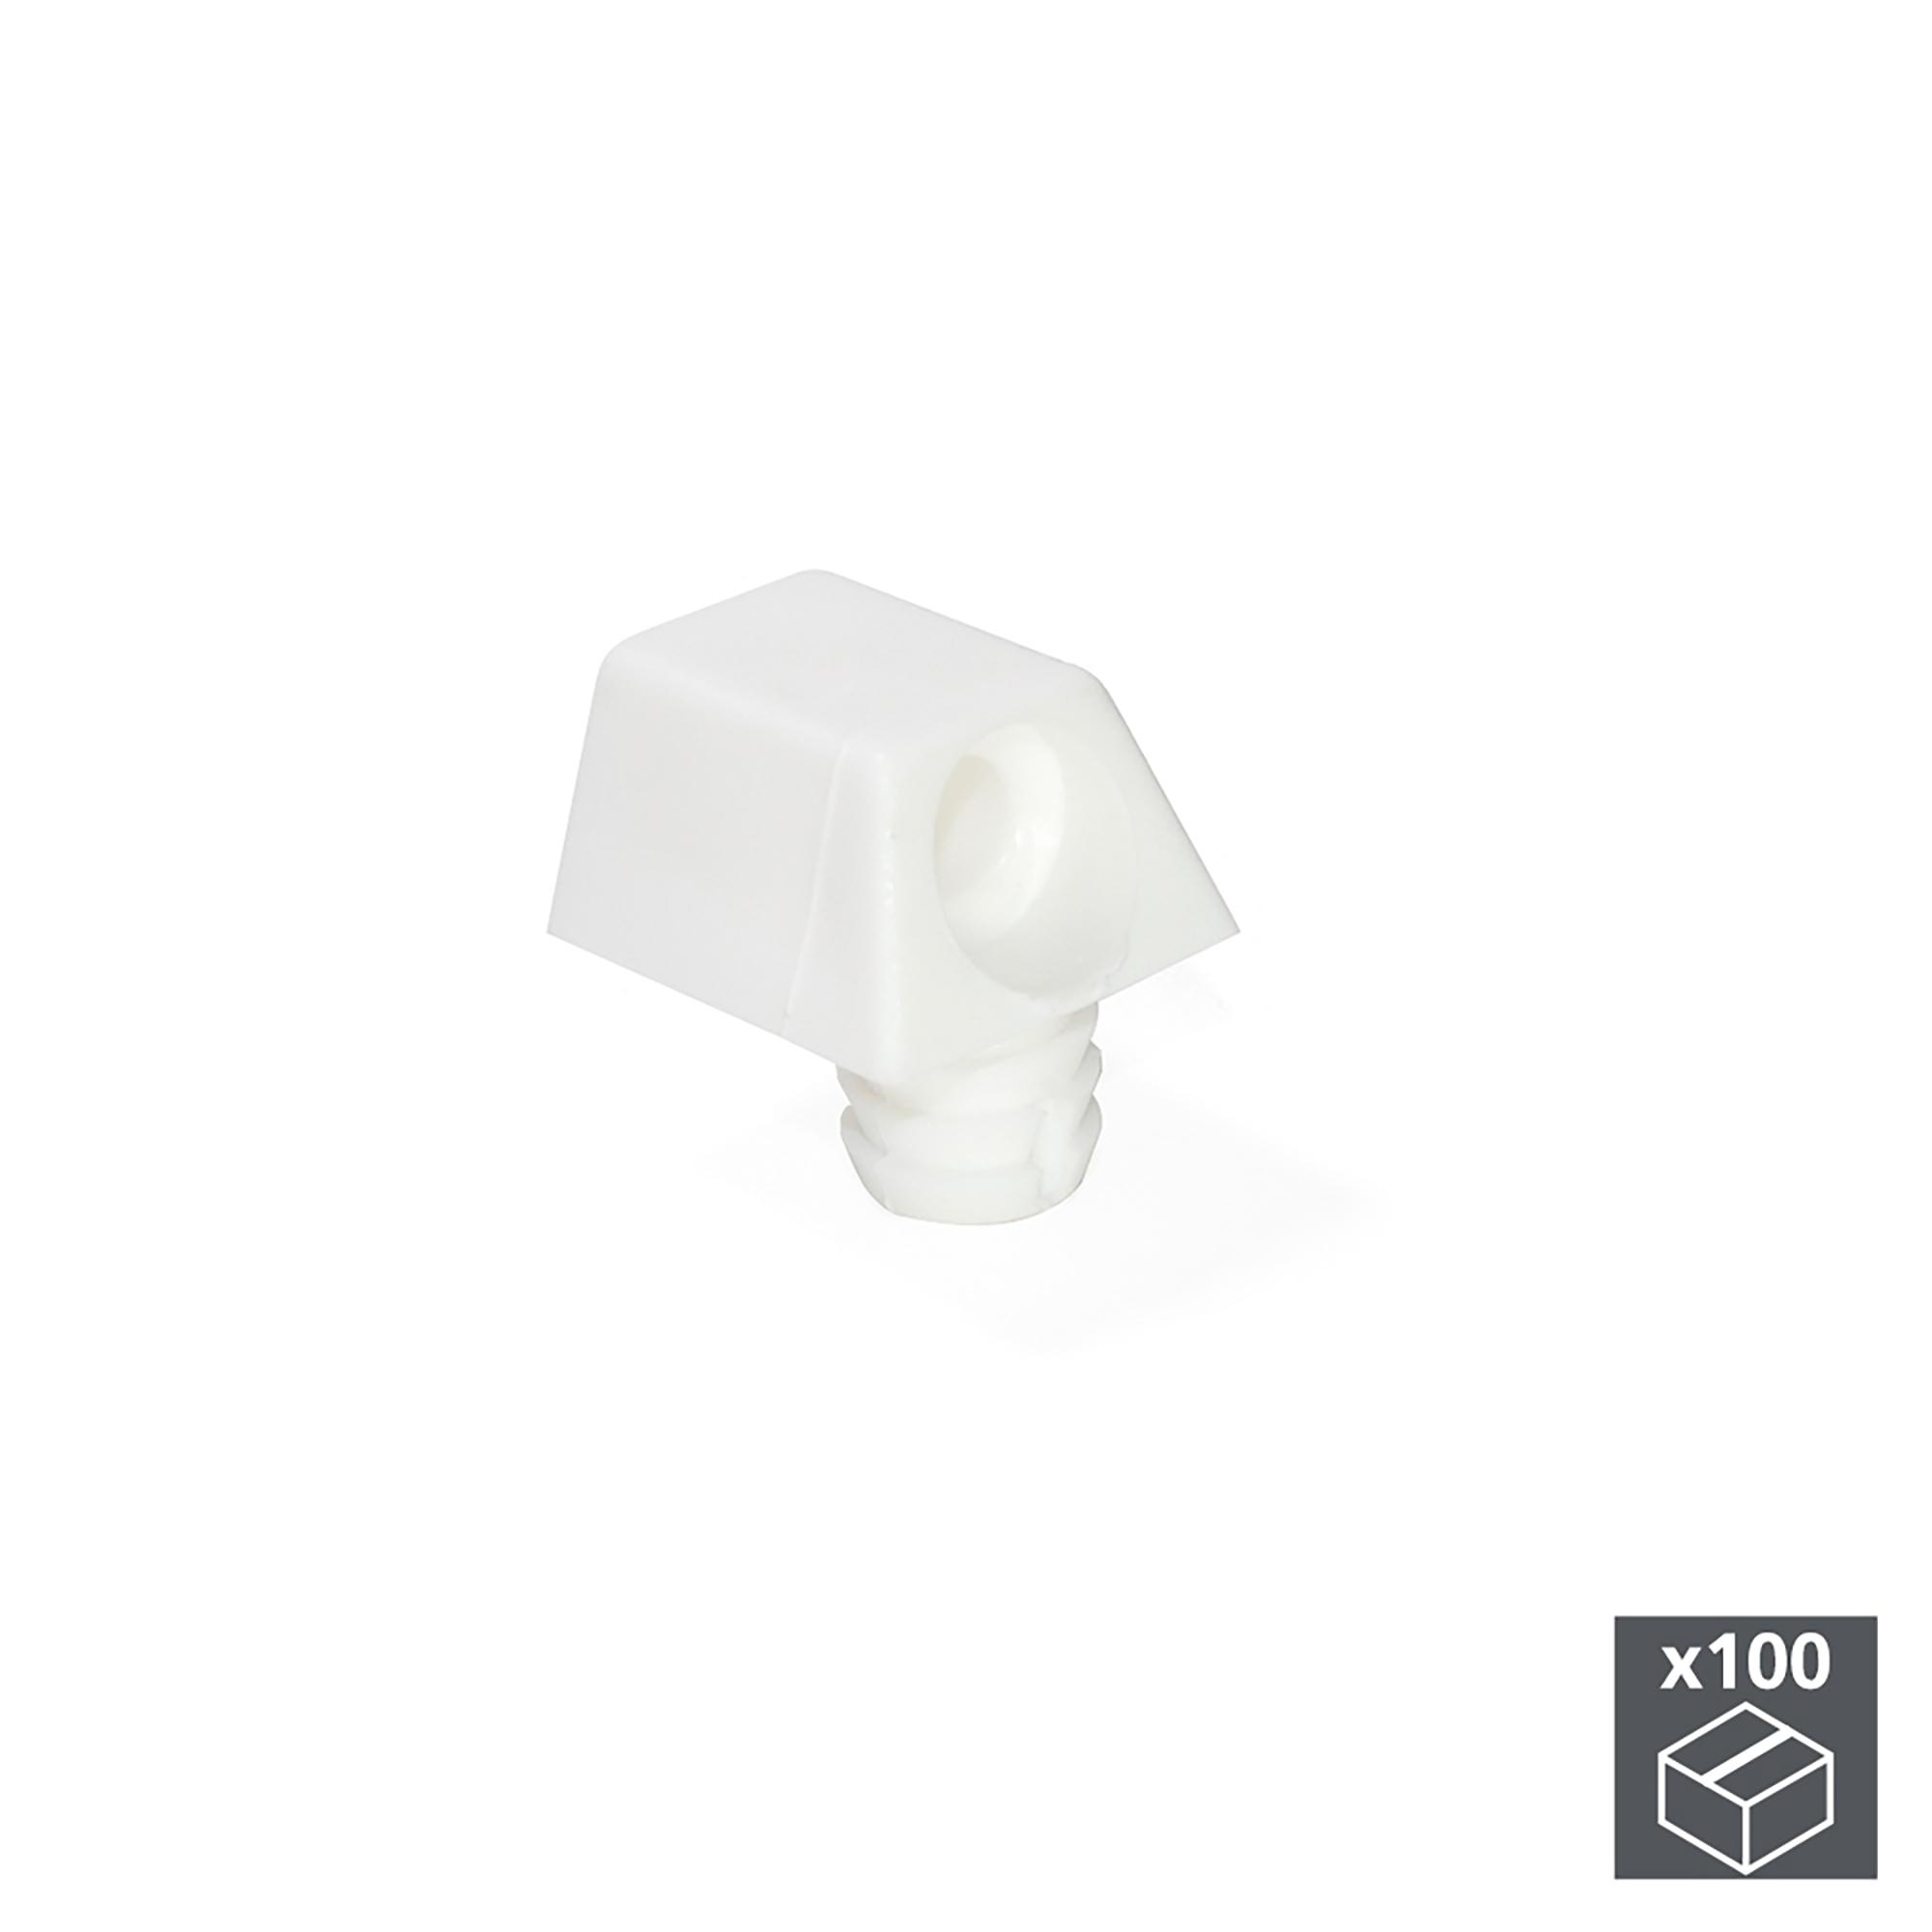 Emuca Supporto per ripiani, 12 mm, Plastica, Bianco, 100 u.